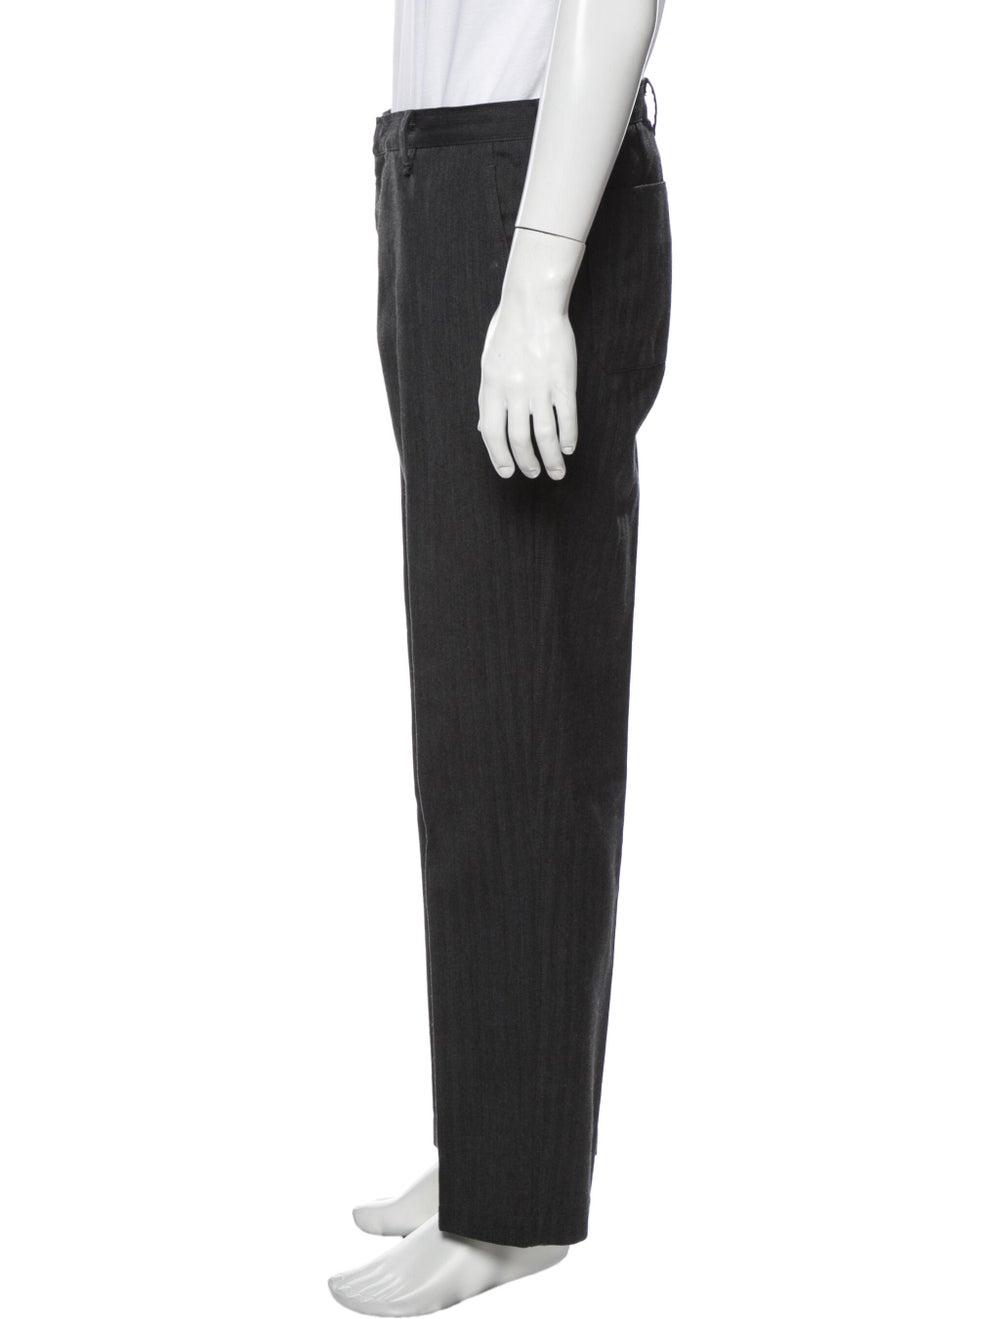 Prada Sport Dress Pants Grey - image 2